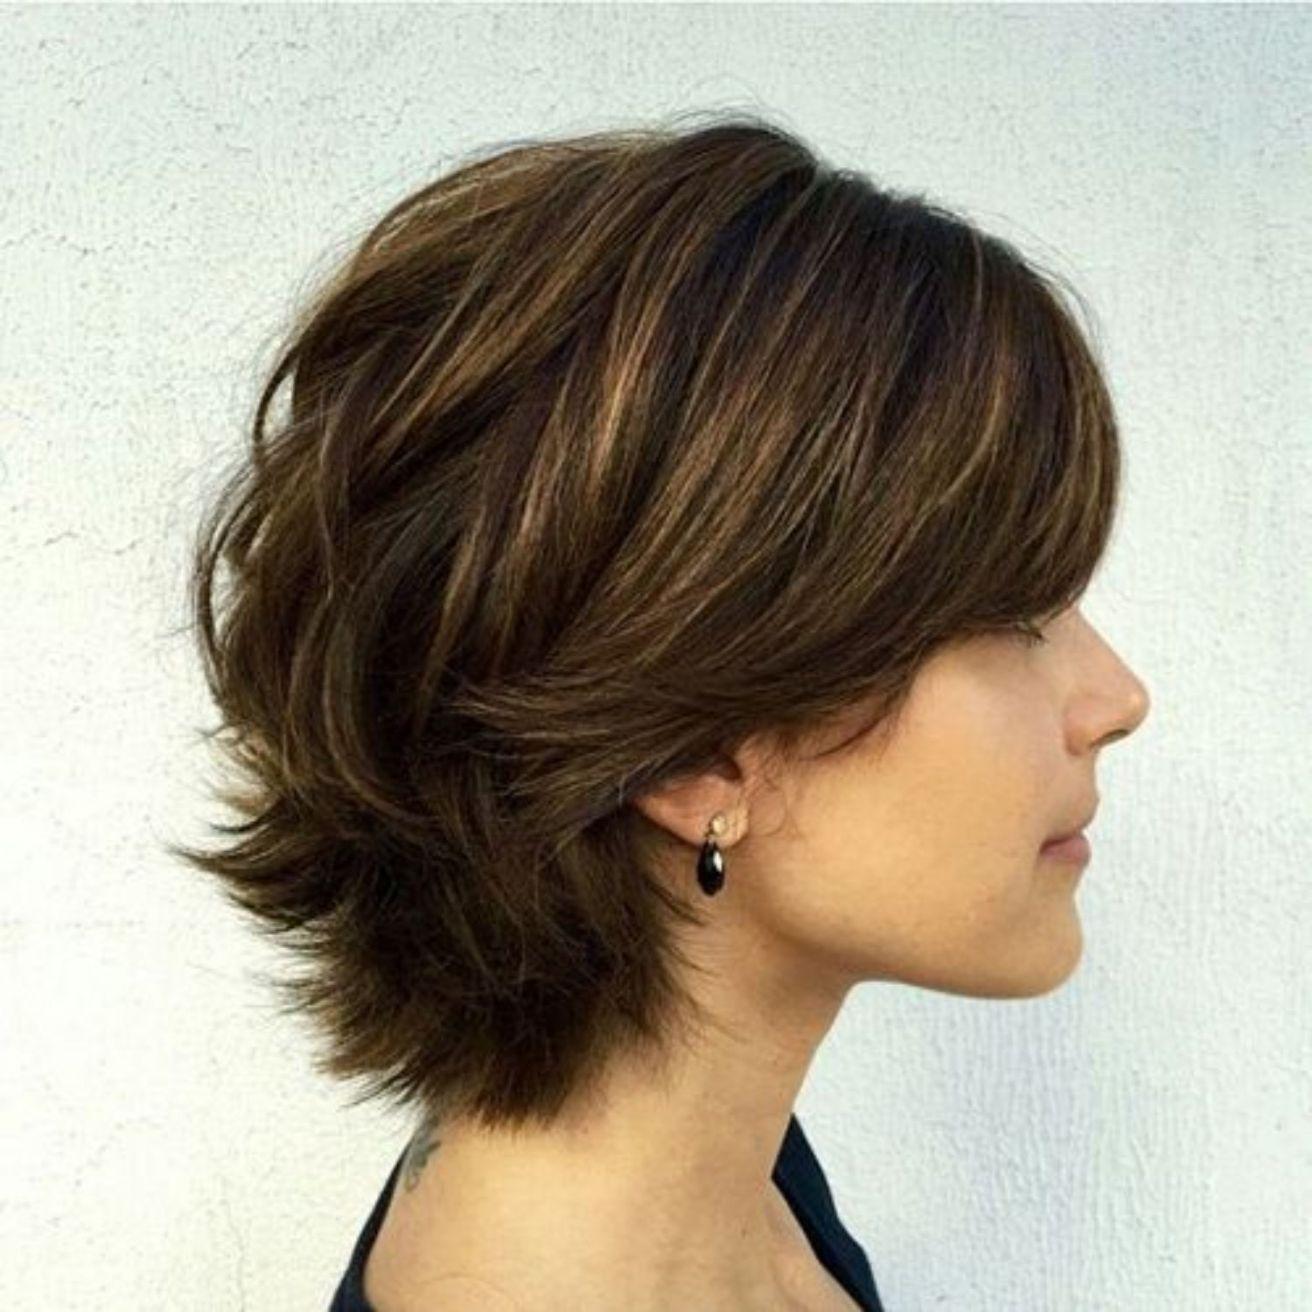 60 Classy Short Haircuts And Hairstyles For Thick Hair Frisuren Kurzhaarschnitte Frisur Dicke Haare